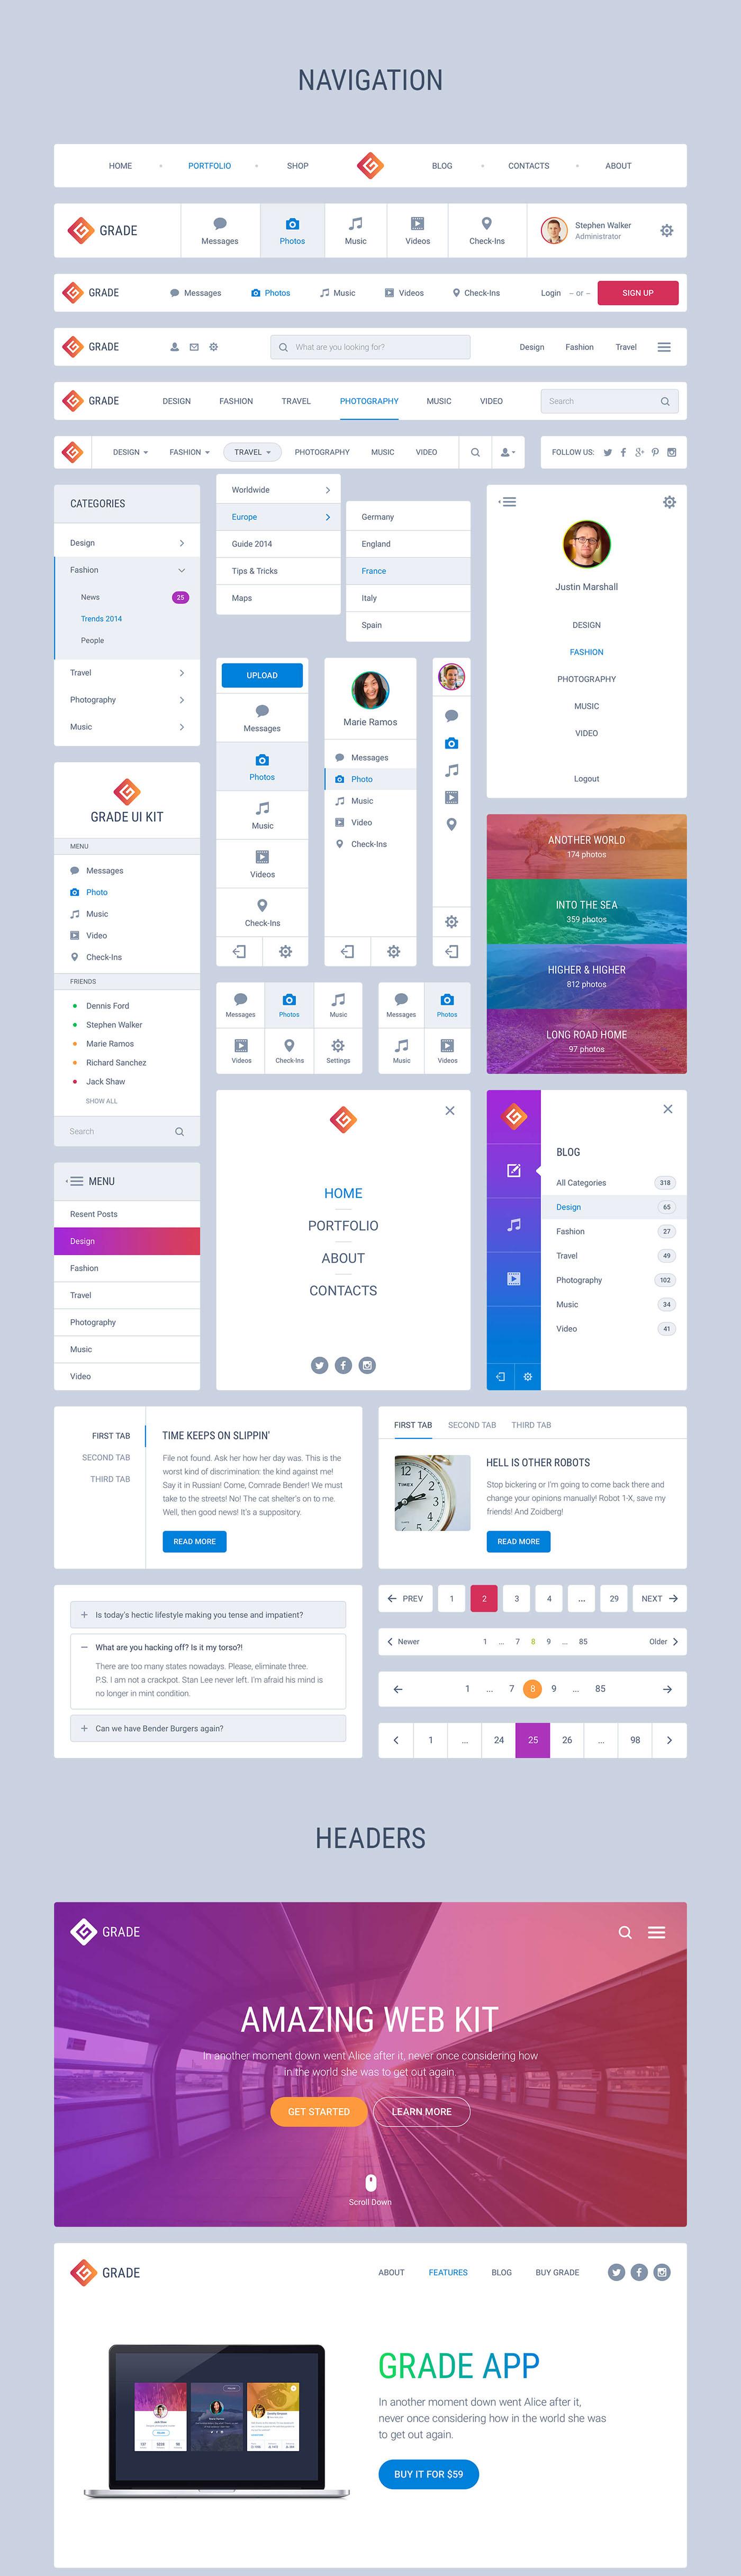 UI ui kit ui pack Interface user interface components elements Web Website Blog dashboard navigation menu social Ecommerce